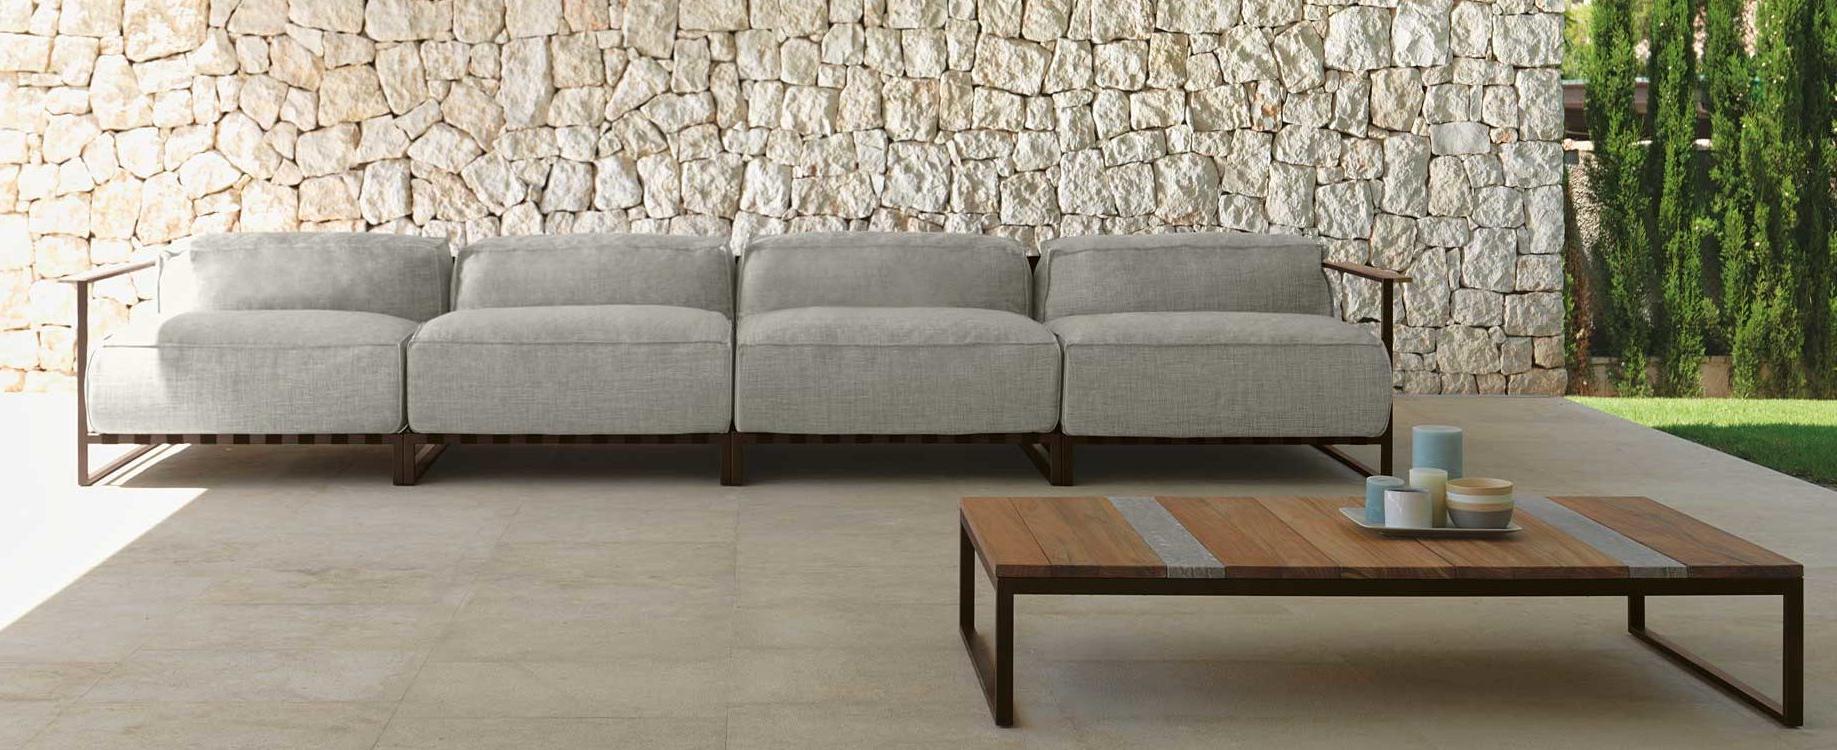 Famous Modular Luxury Sectional Sofa Modern Weather Resistance Regarding Paul Modular Sectional Sofas Blue (View 16 of 25)